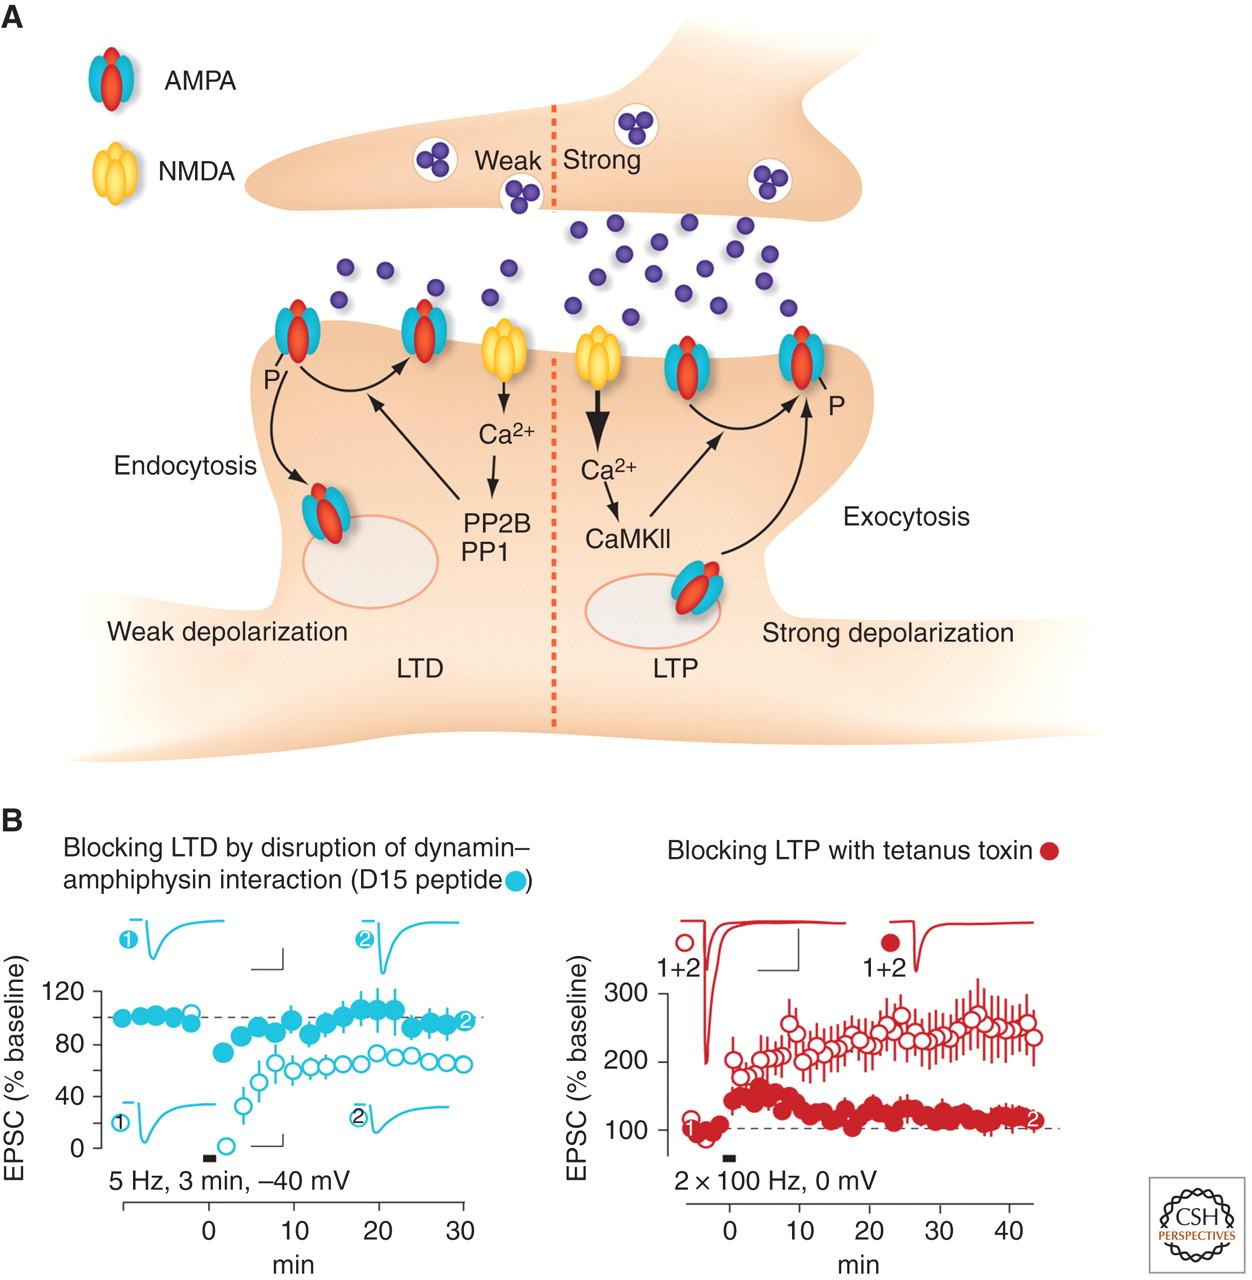 nmda receptor dependent long term potentiation and long termnmda receptor dependent long term potentiation and long term depression (ltp ltd)